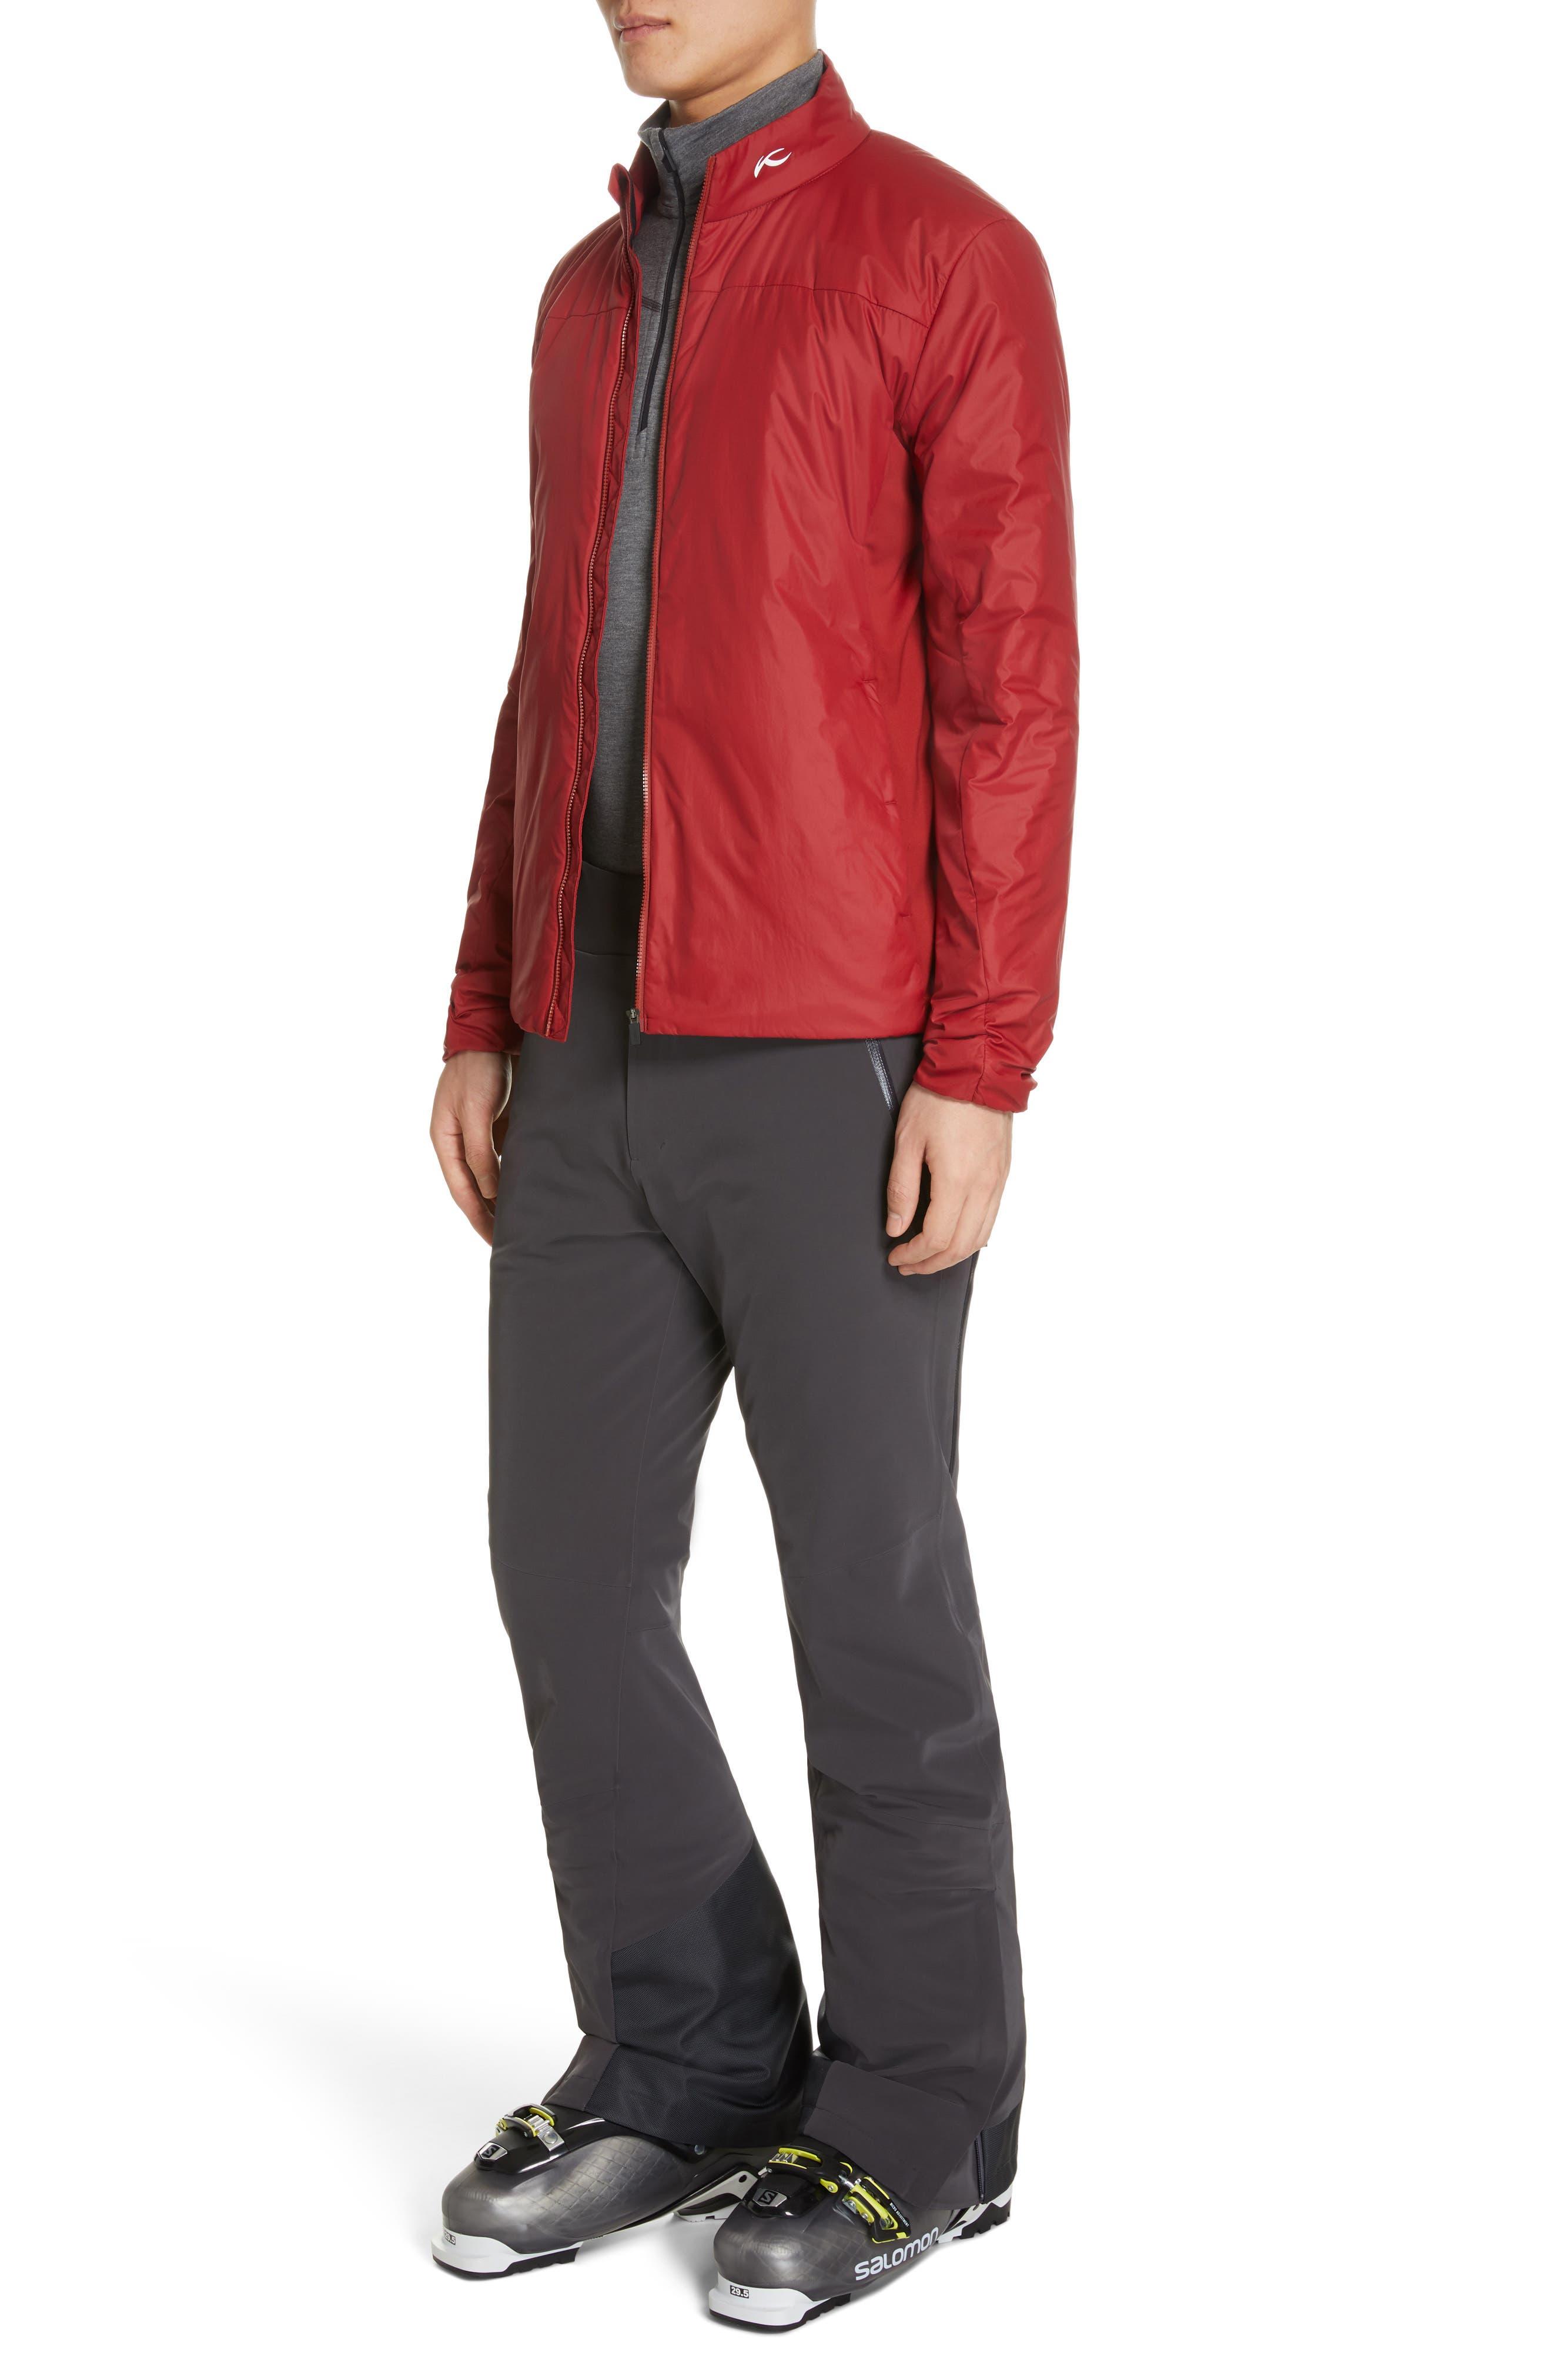 Radiation Waterproof Jacket,                             Alternate thumbnail 5, color,                             RED DAHLIA